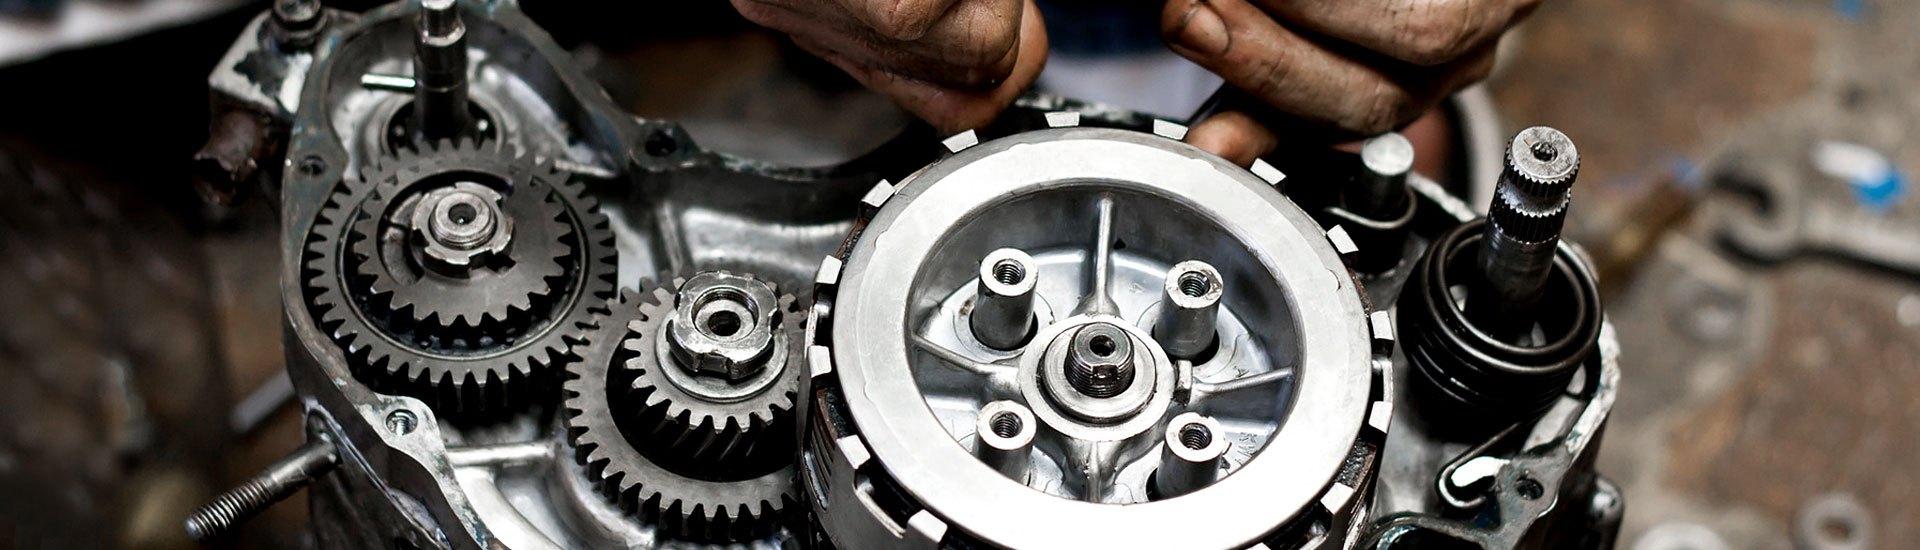 Powersports Drivetrain & Transmission Parts